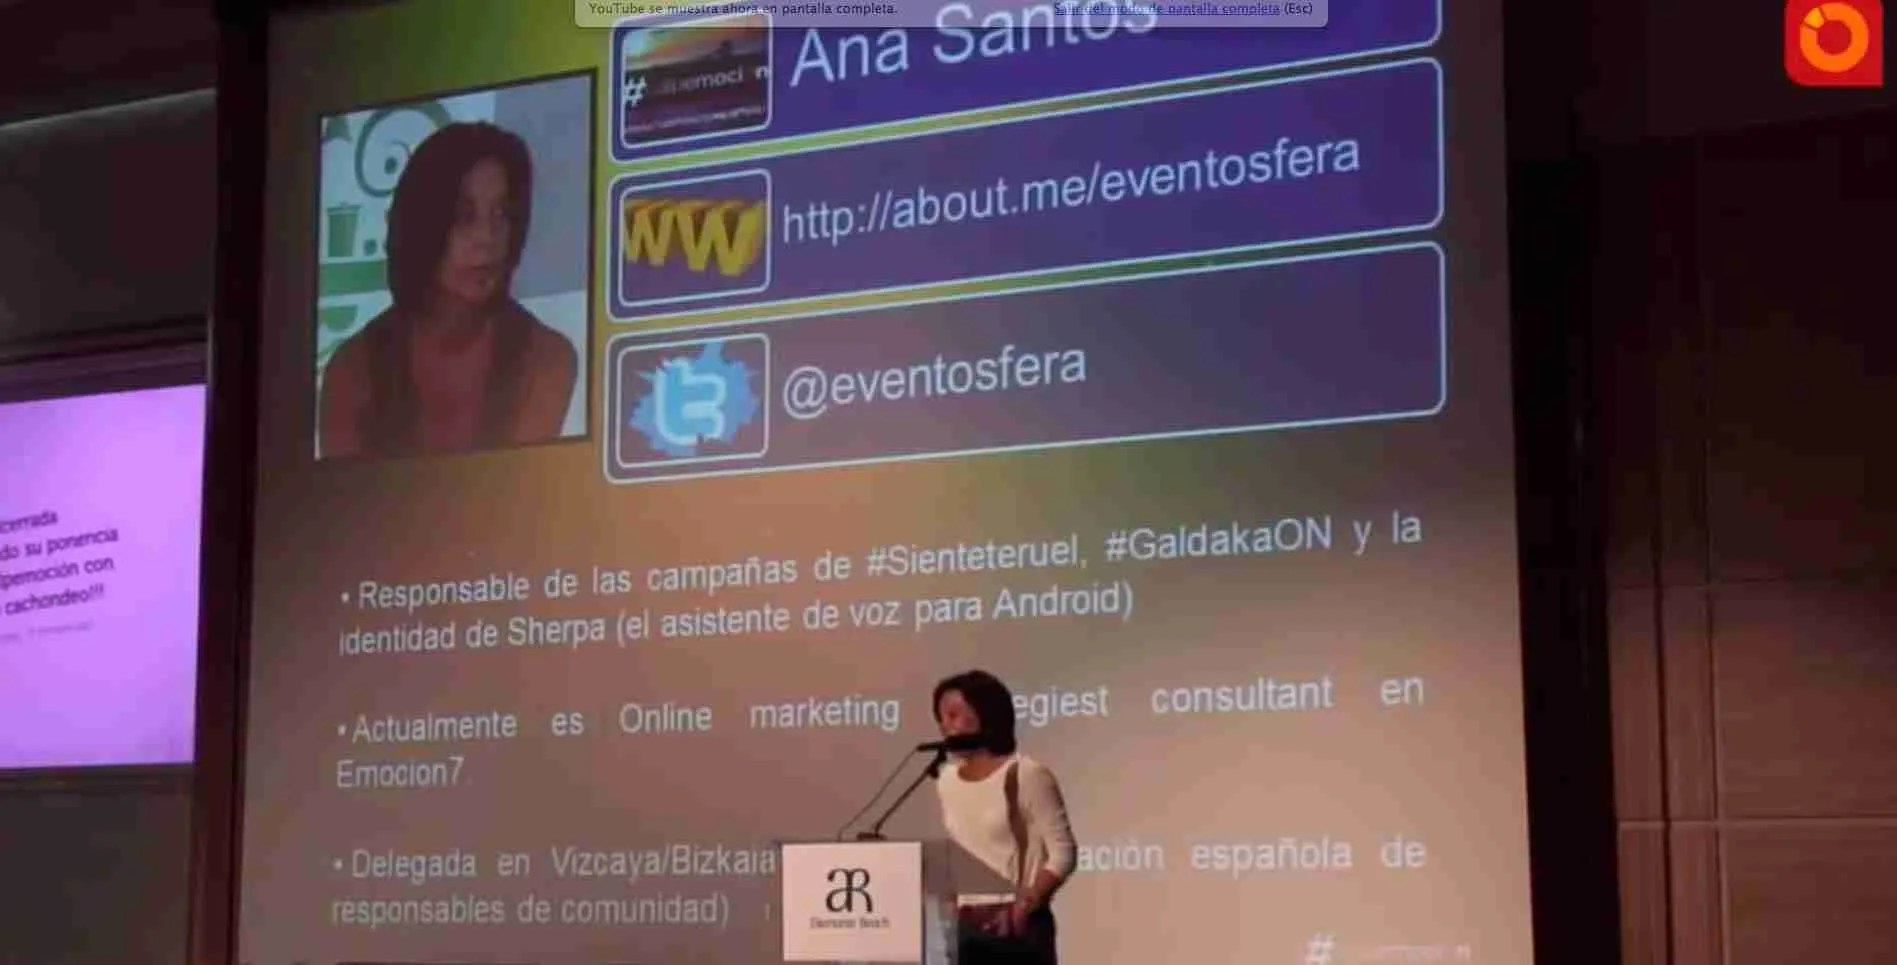 conferencia Ana Santos Eventosfera